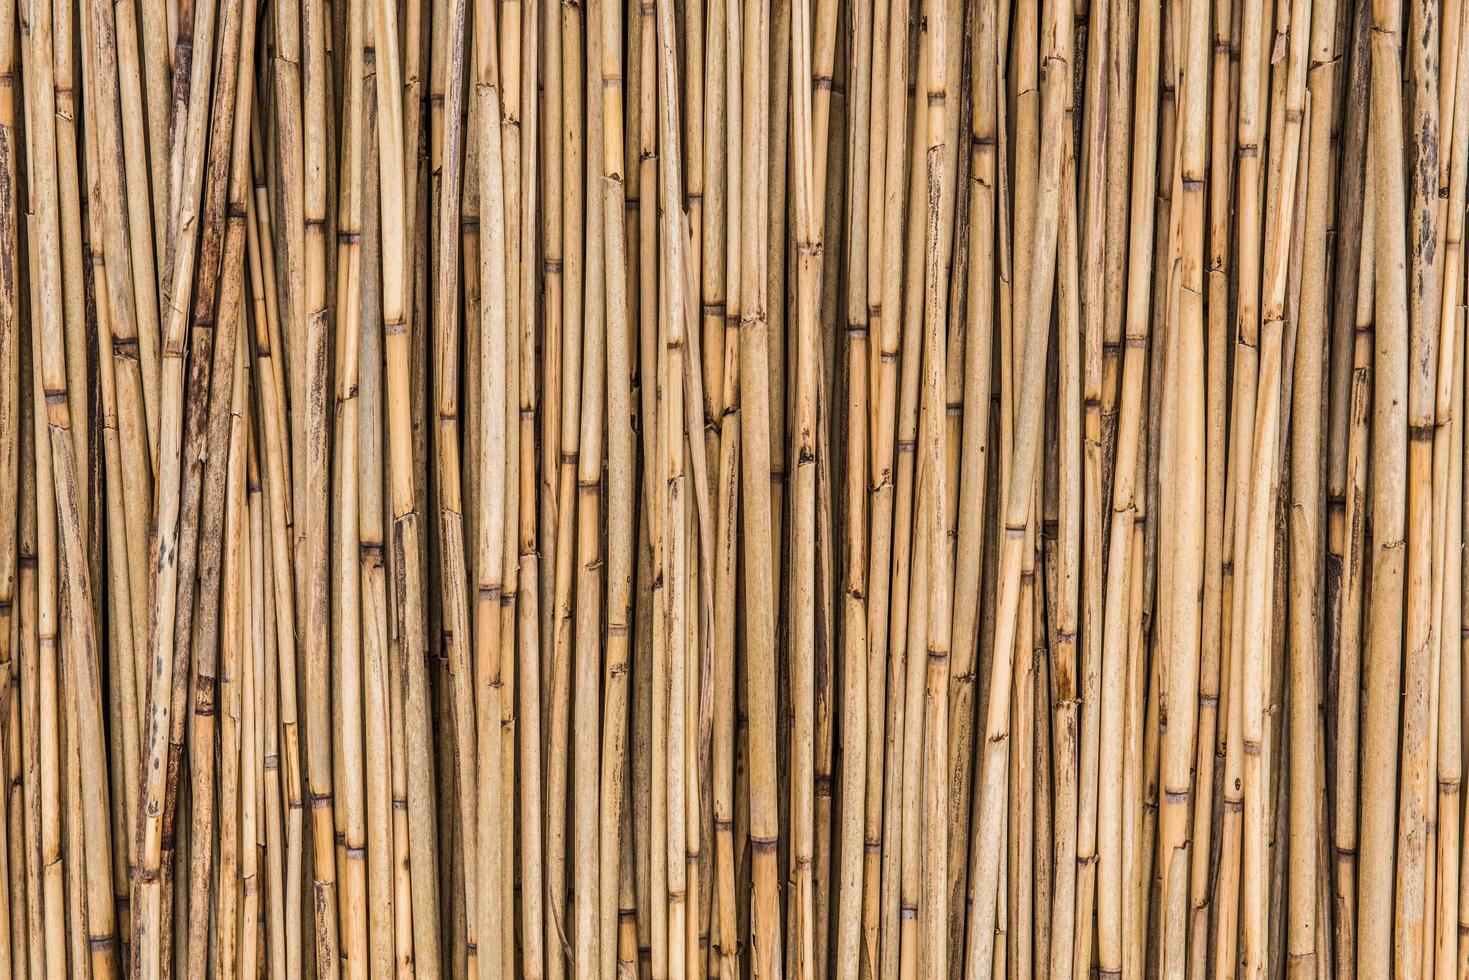 bambu stick bakgrund foto